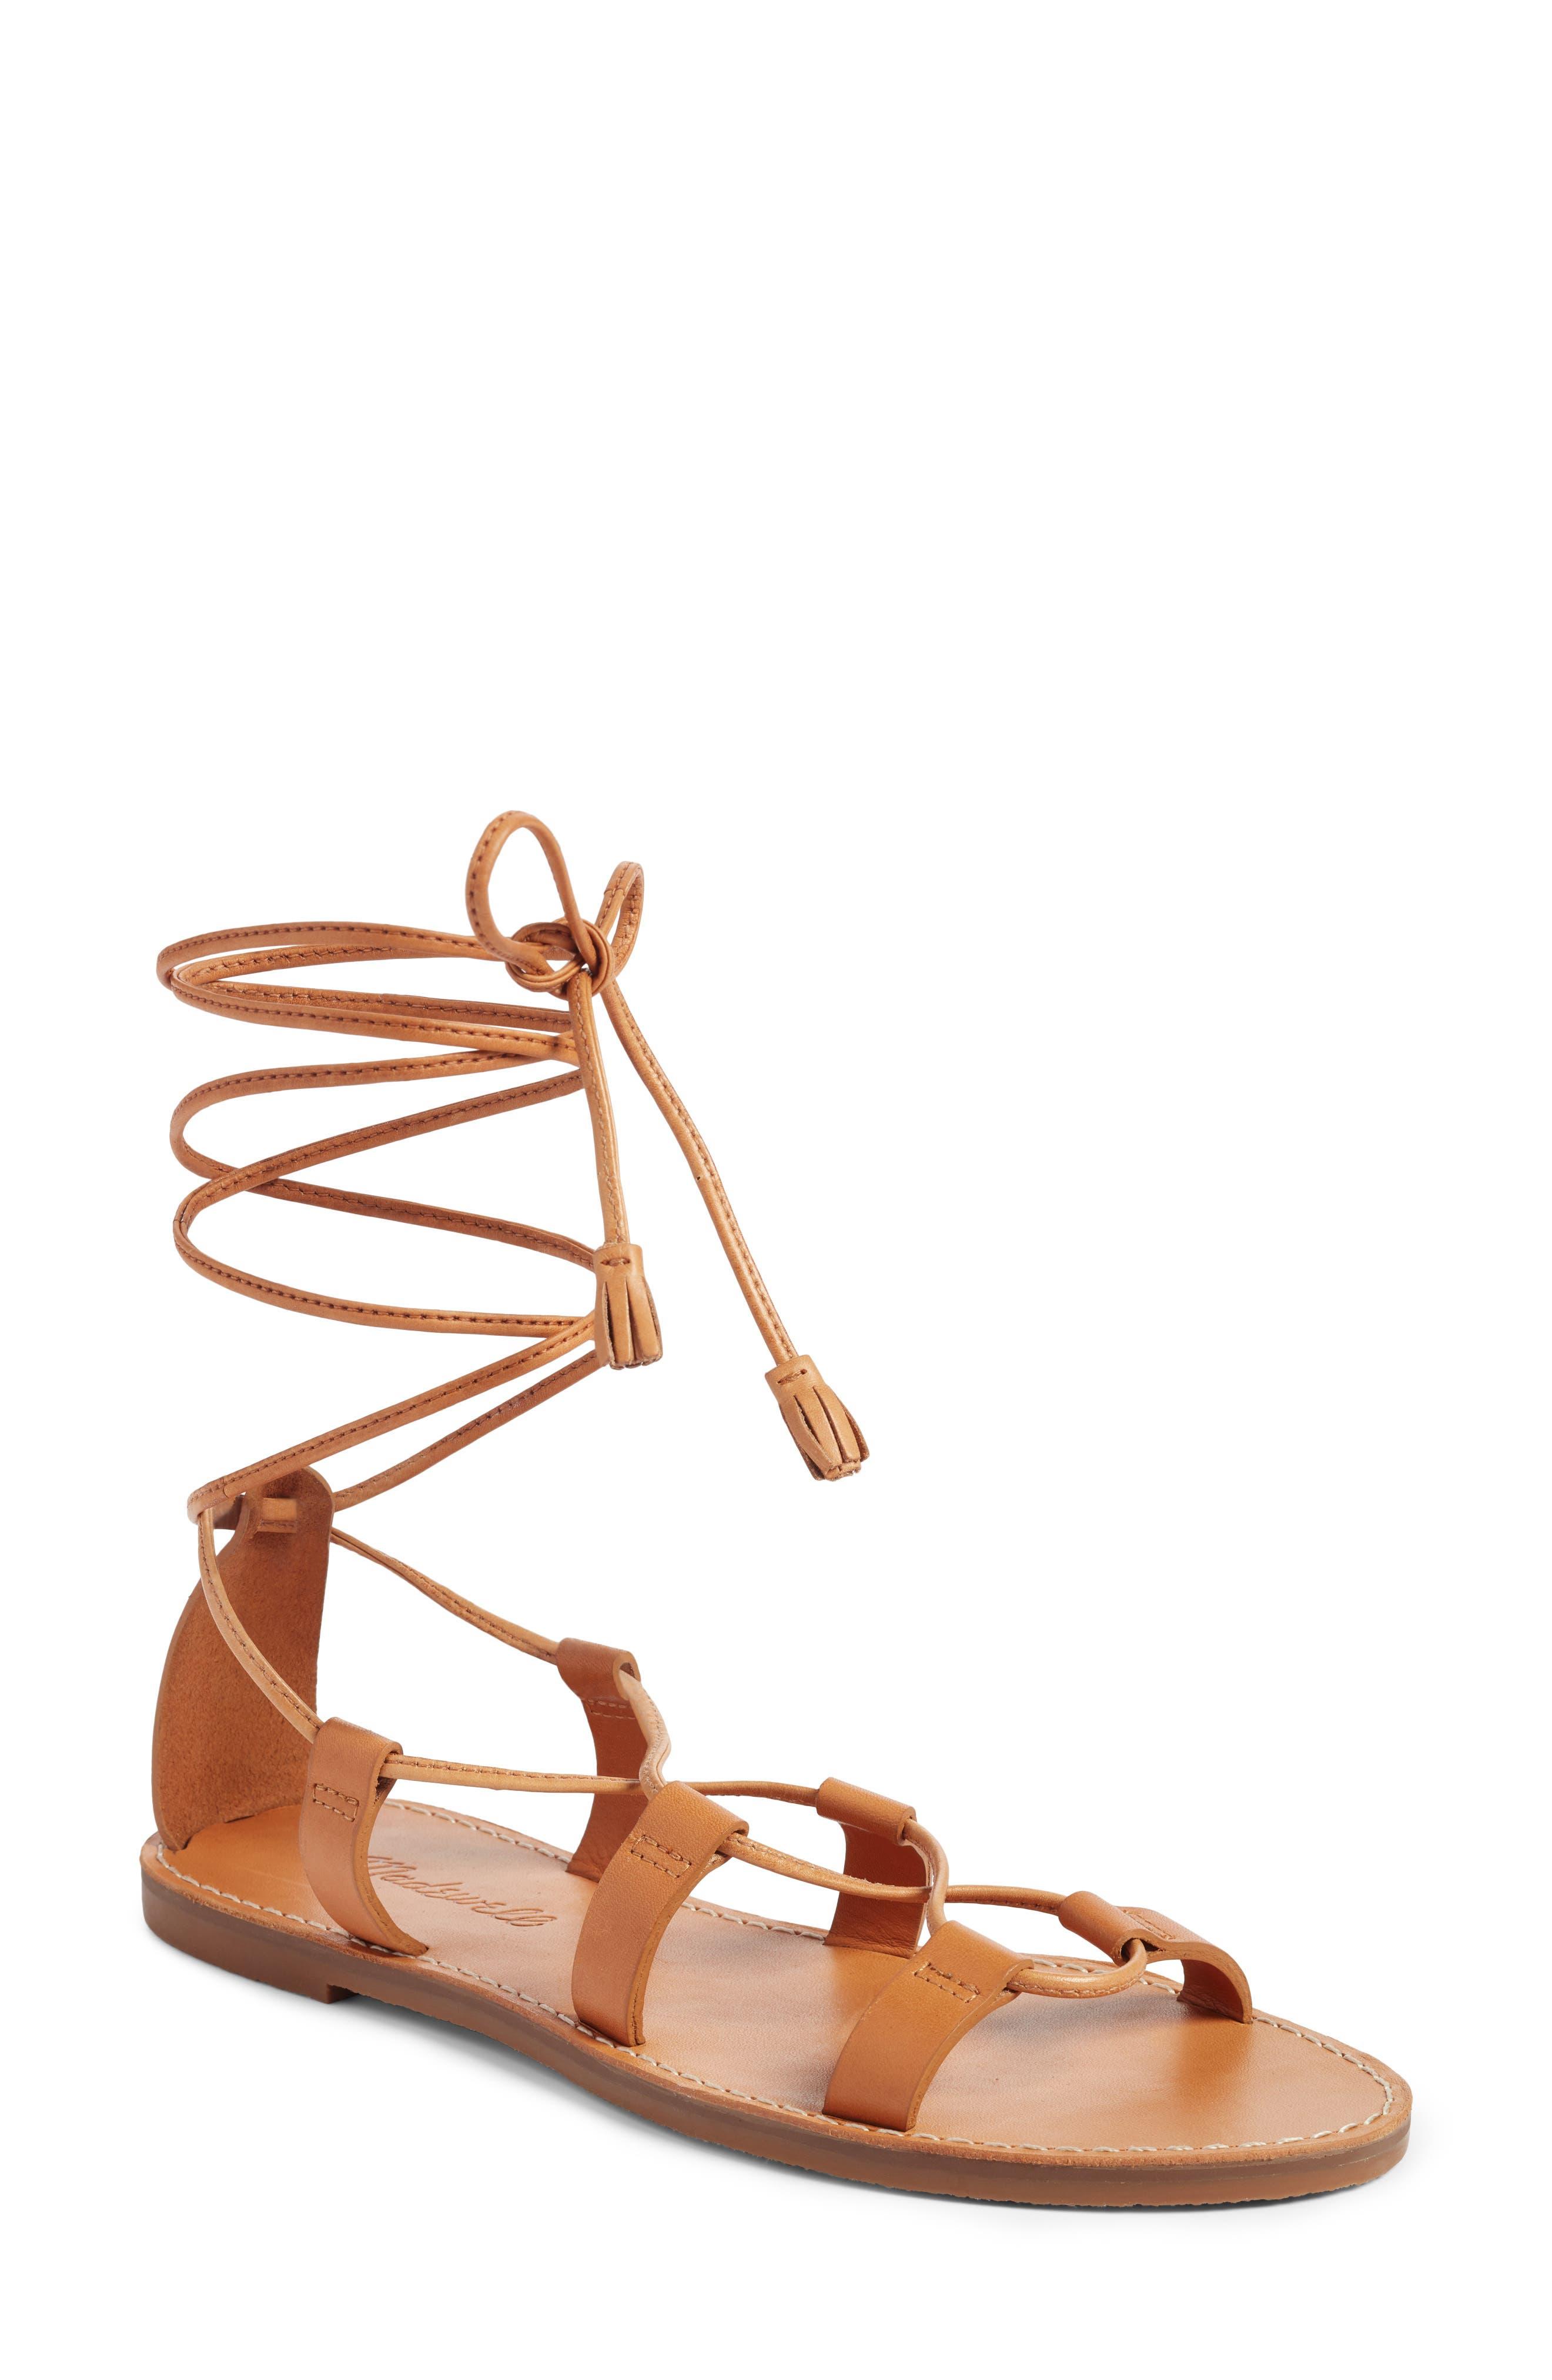 The Boardwalk Lace-Up Sandal,                         Main,                         color, DESERT CAMEL LEATHER